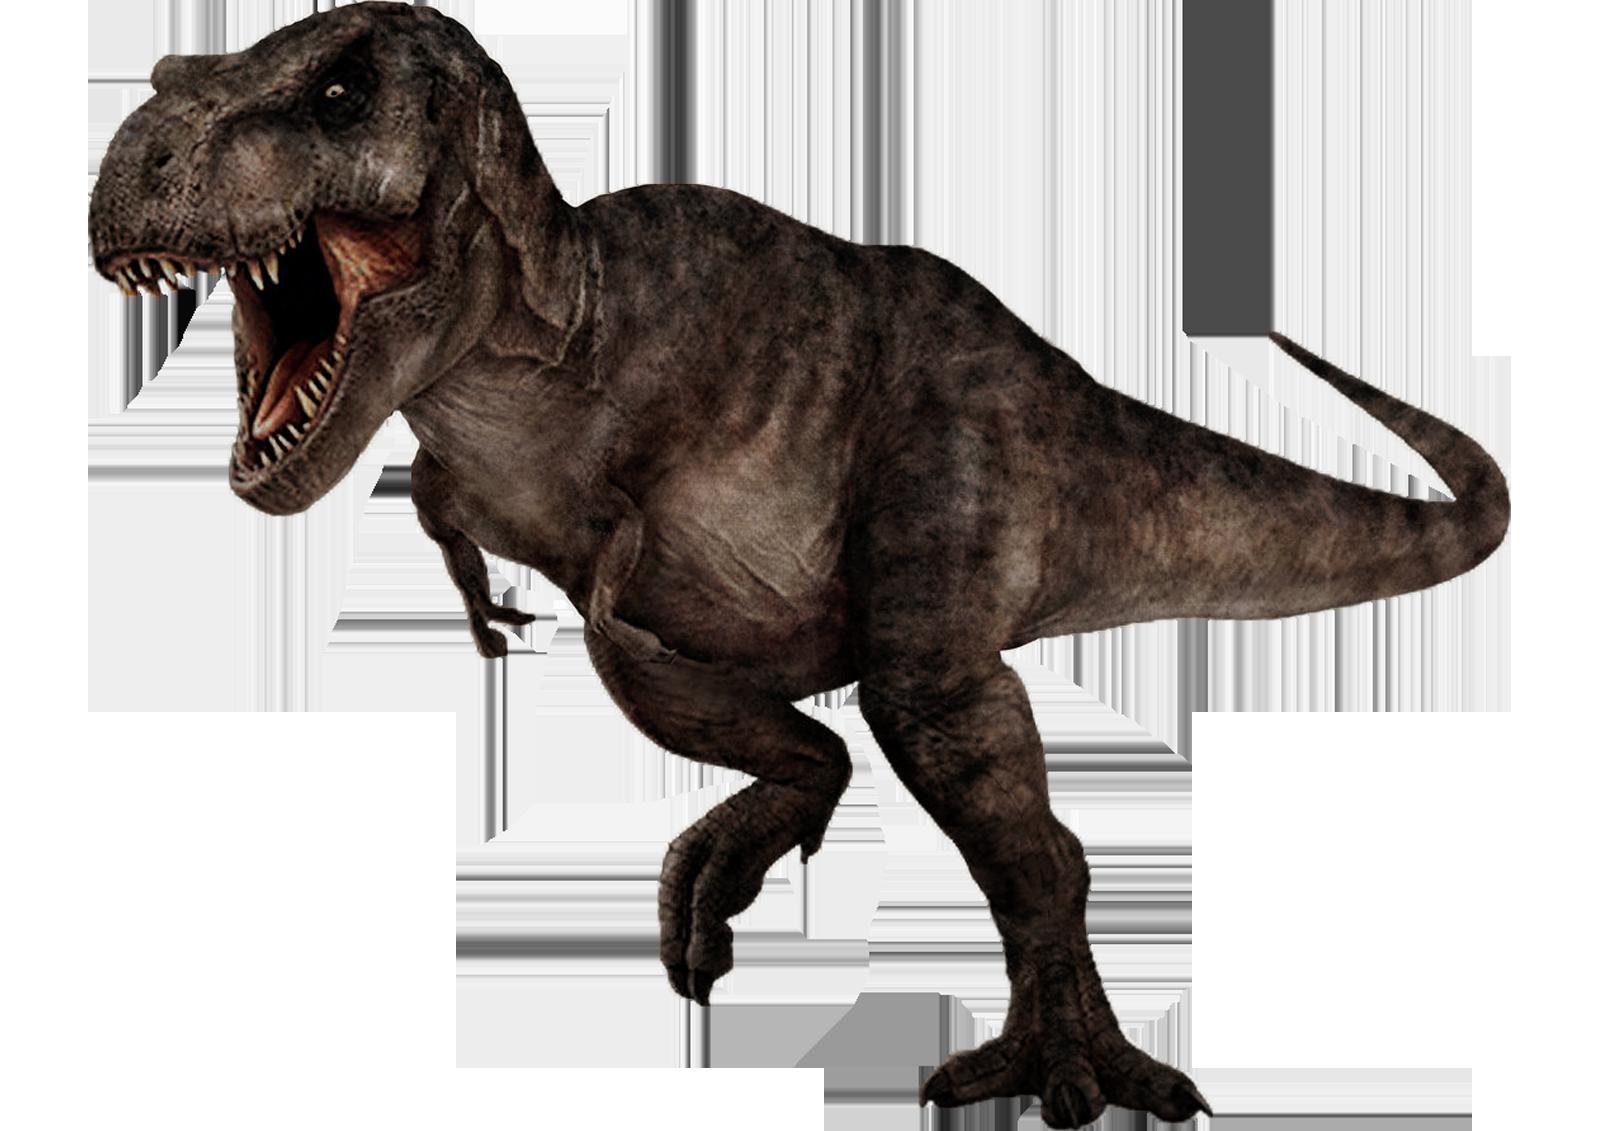 Tyrannosaurus rex 2 by darbarrrr on deviantart for Tyranosaurus